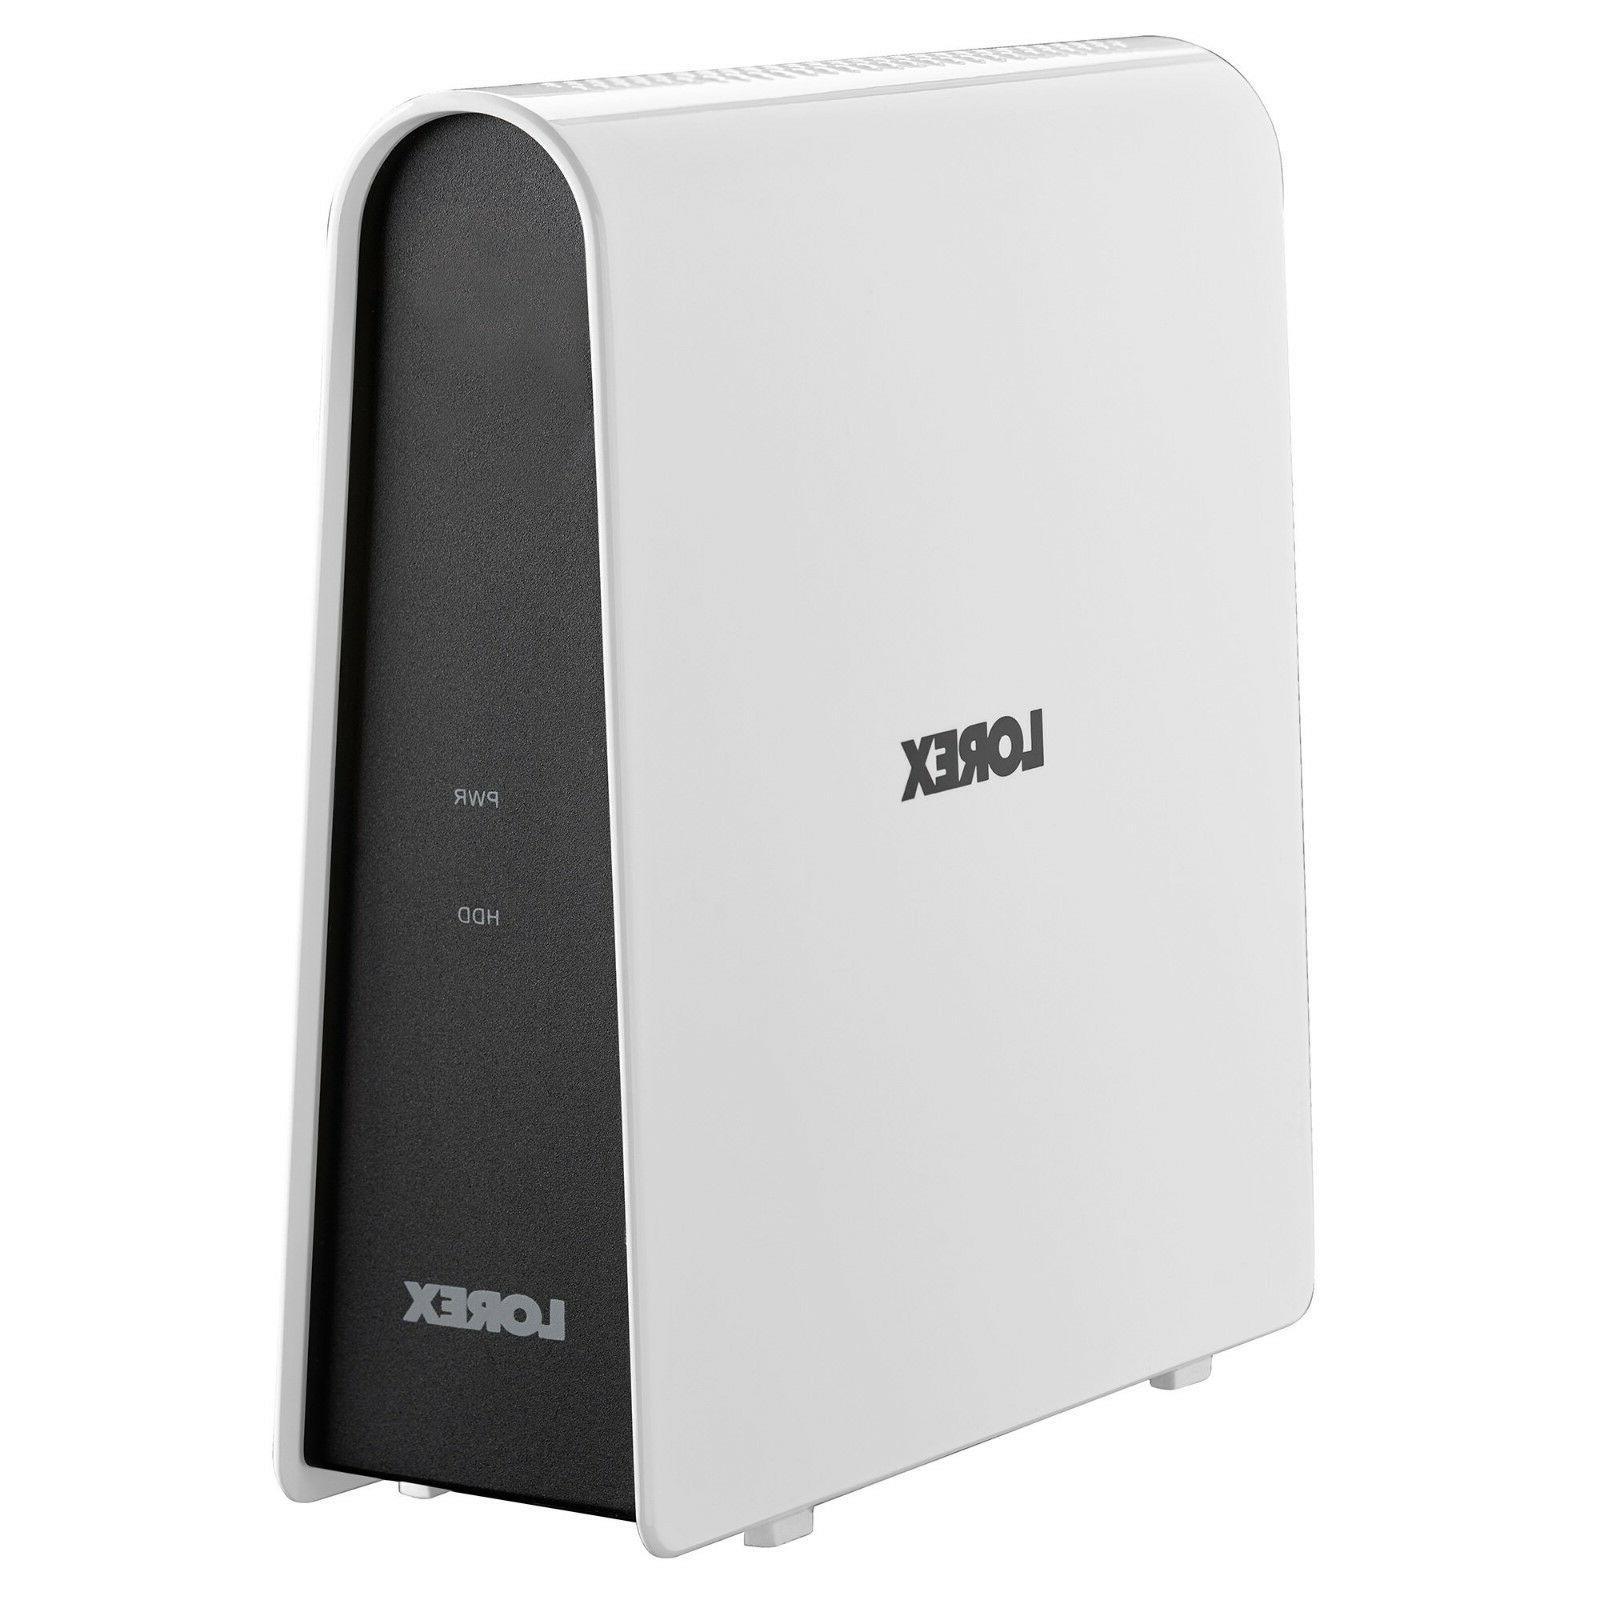 Lorex 1080p free Security Camera 4 Wireless Cameras DVR NIB